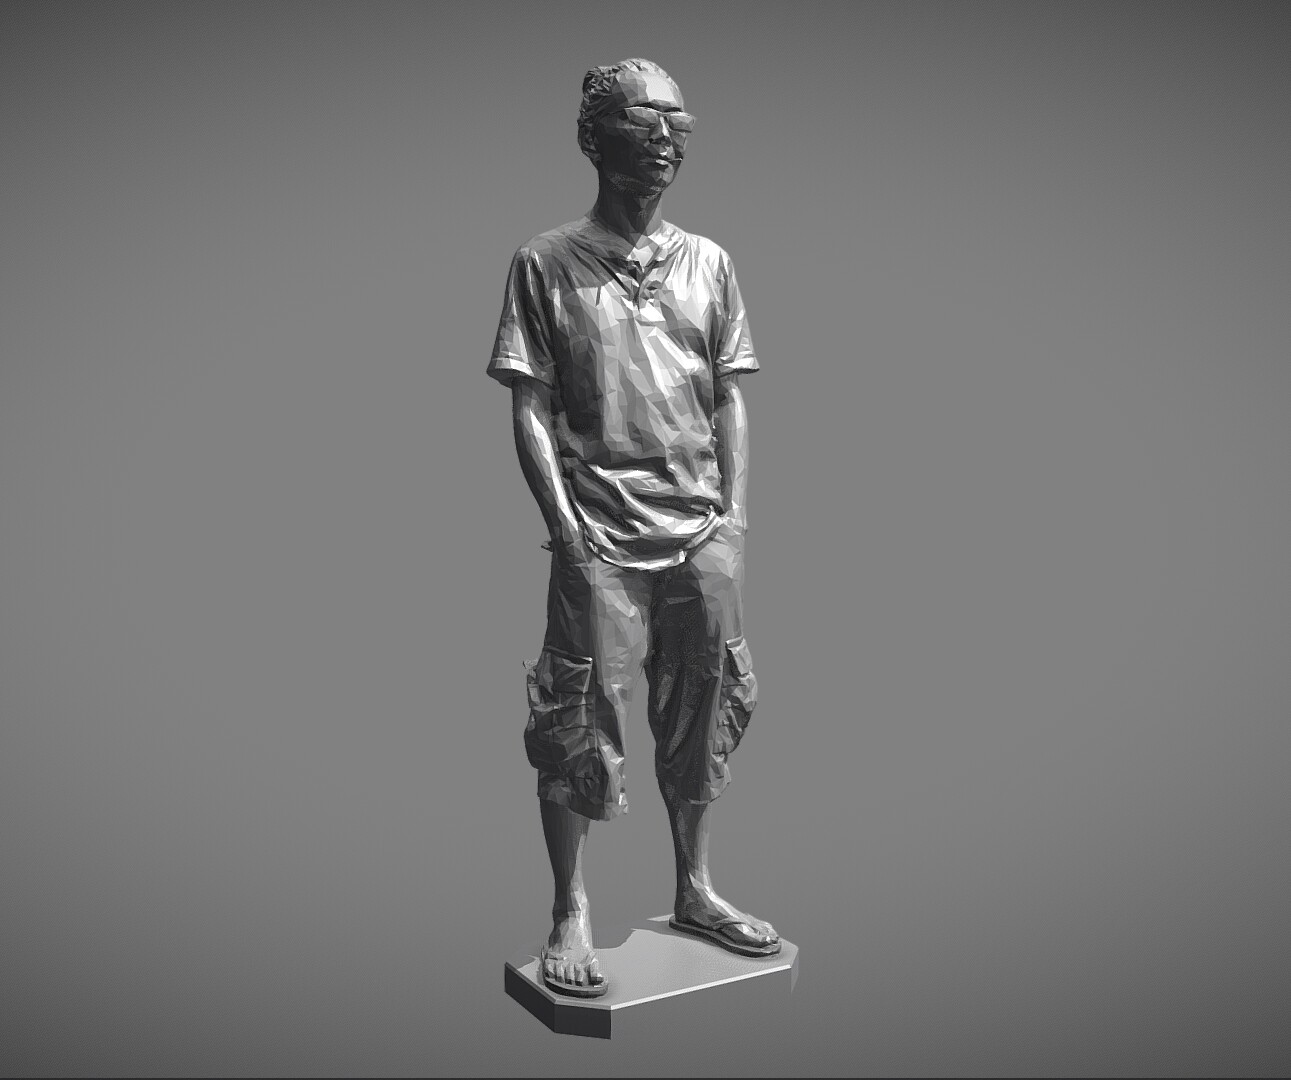 Michael wu 3d models by mwopus mwopus sketchfab20190320 007959